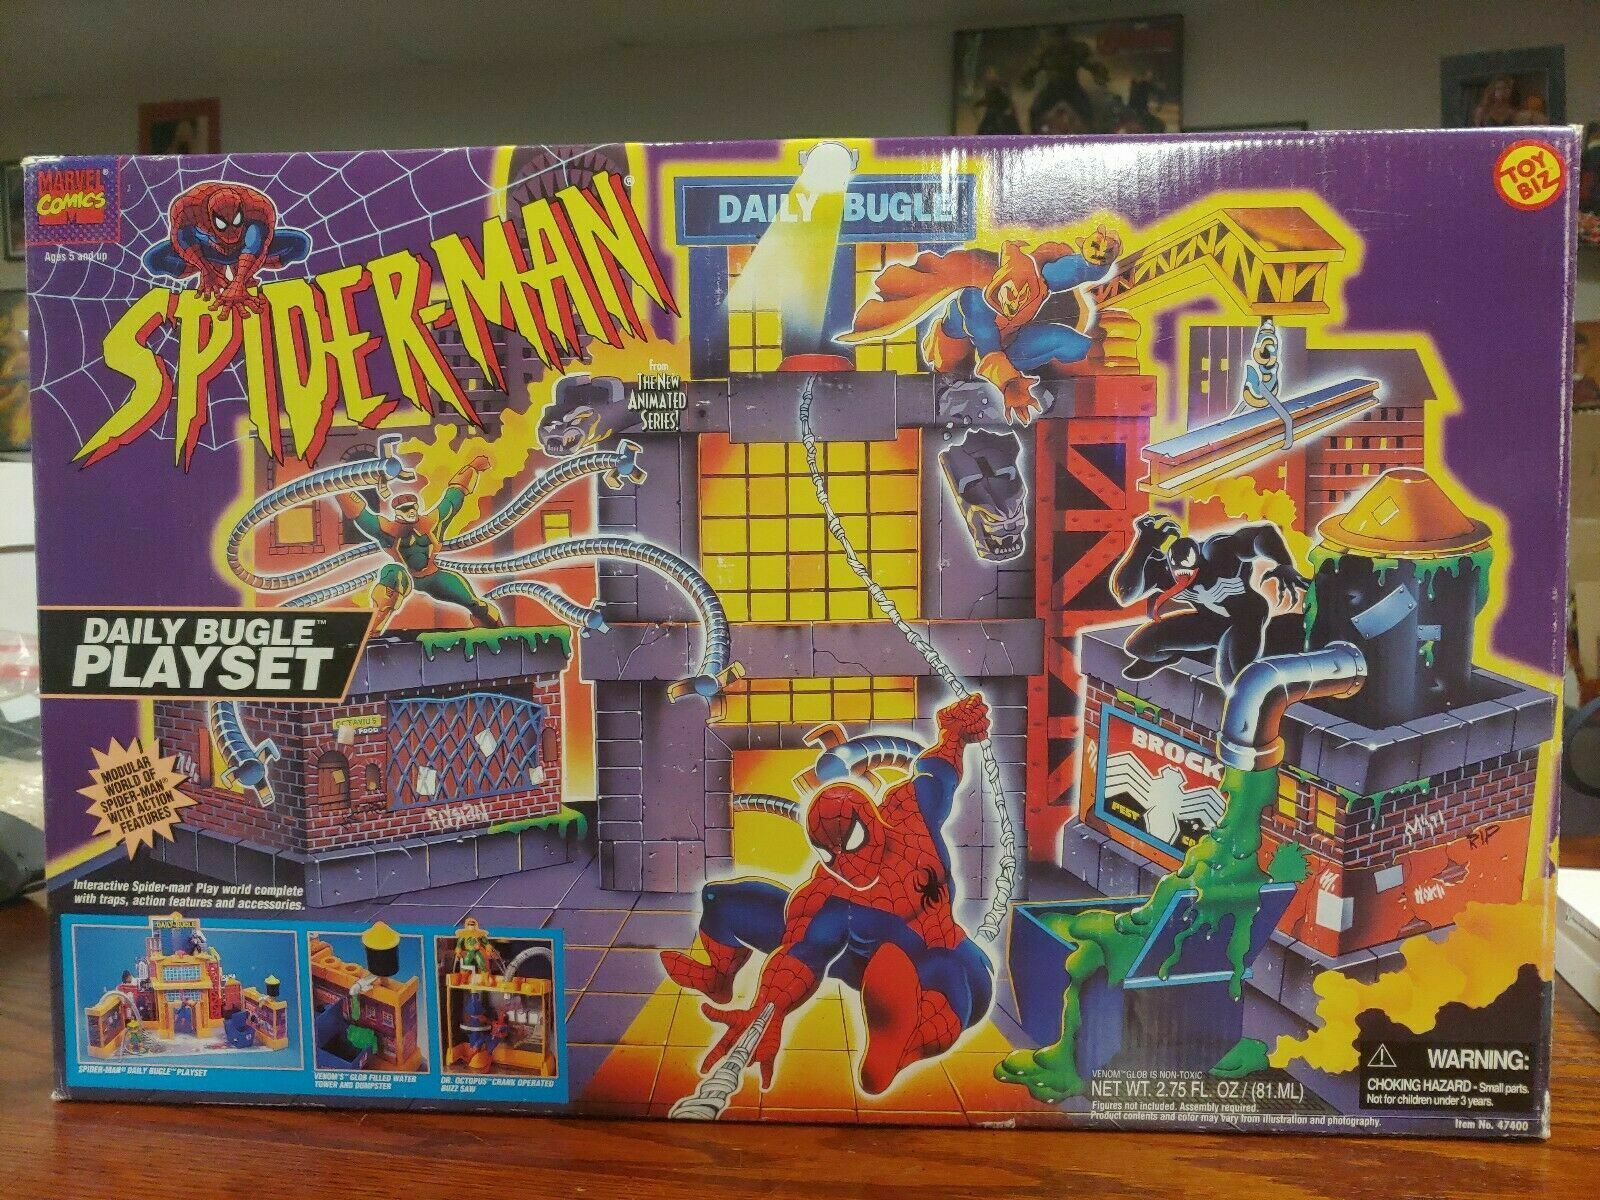 Spiderman Daily Bugle Playset  New Meerled Rare  BY Spielzeug BIZ